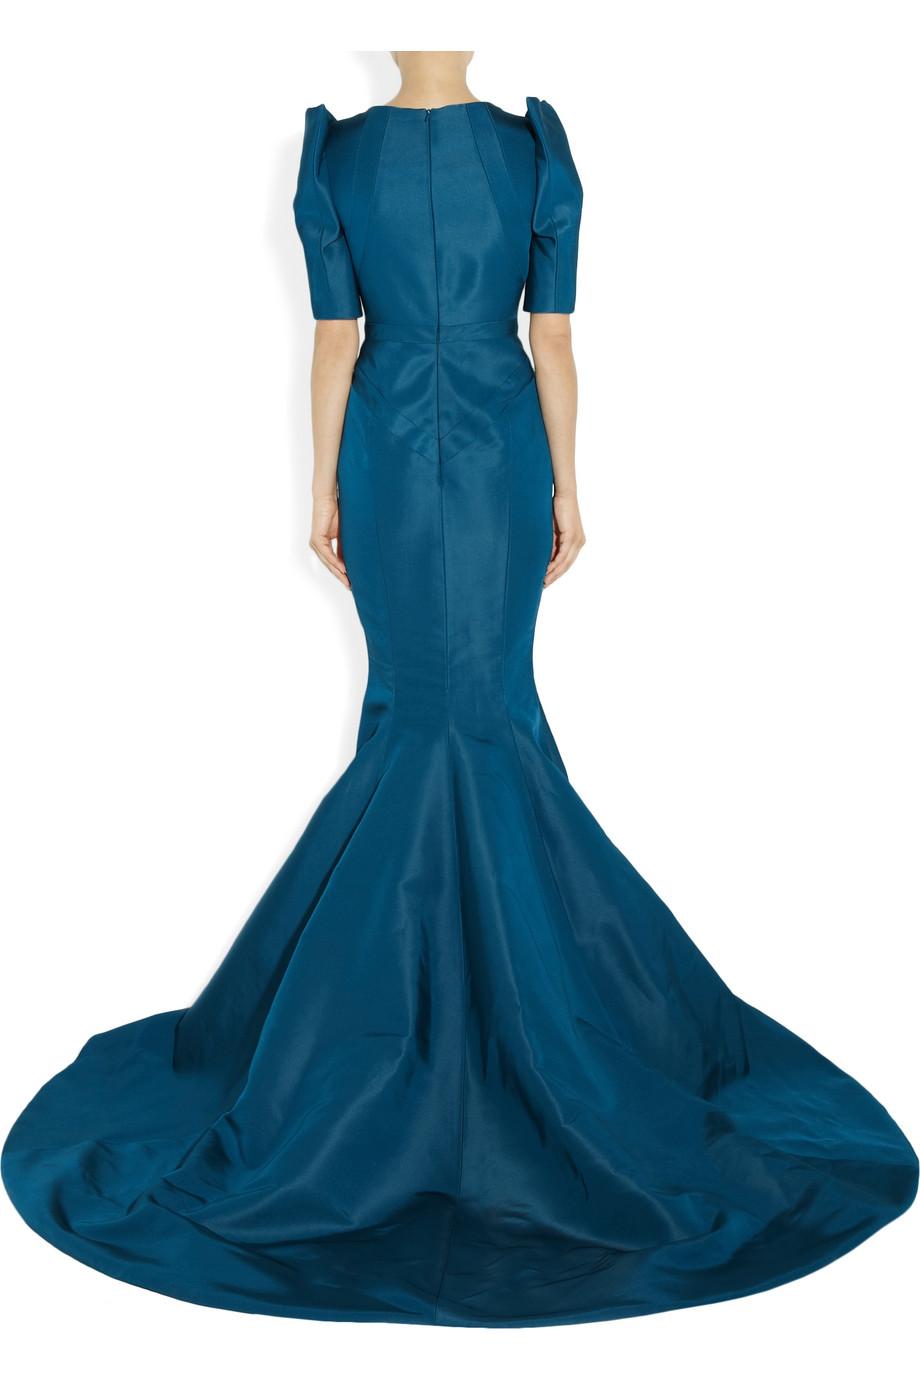 Zac Posen Prom Dresses 76